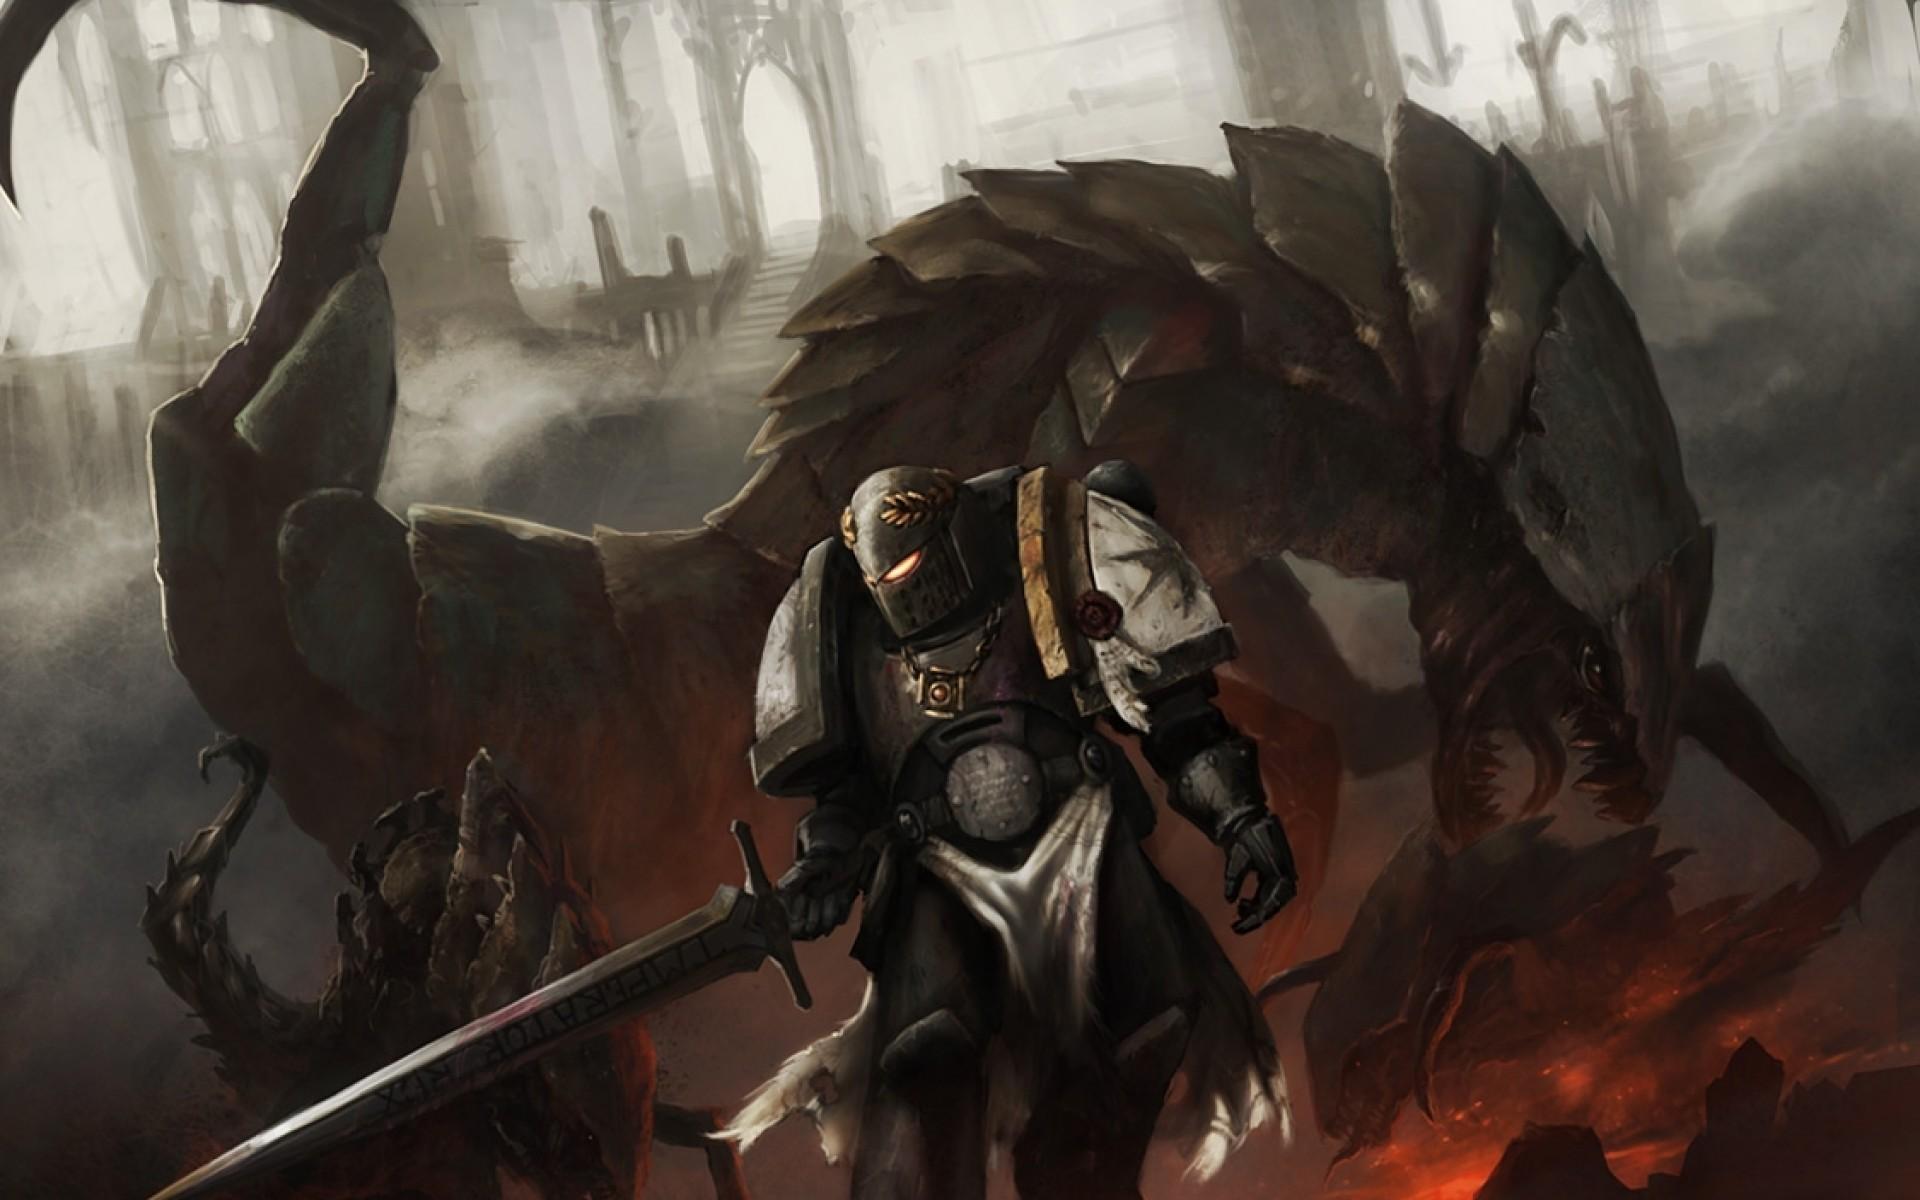 Image – Warhammer 40k space marine artwork tyranids black templar 1125×812 wallpaper  Wallpaper www.wallmay.net.jpg   Warhammer 40k   FANDOM …